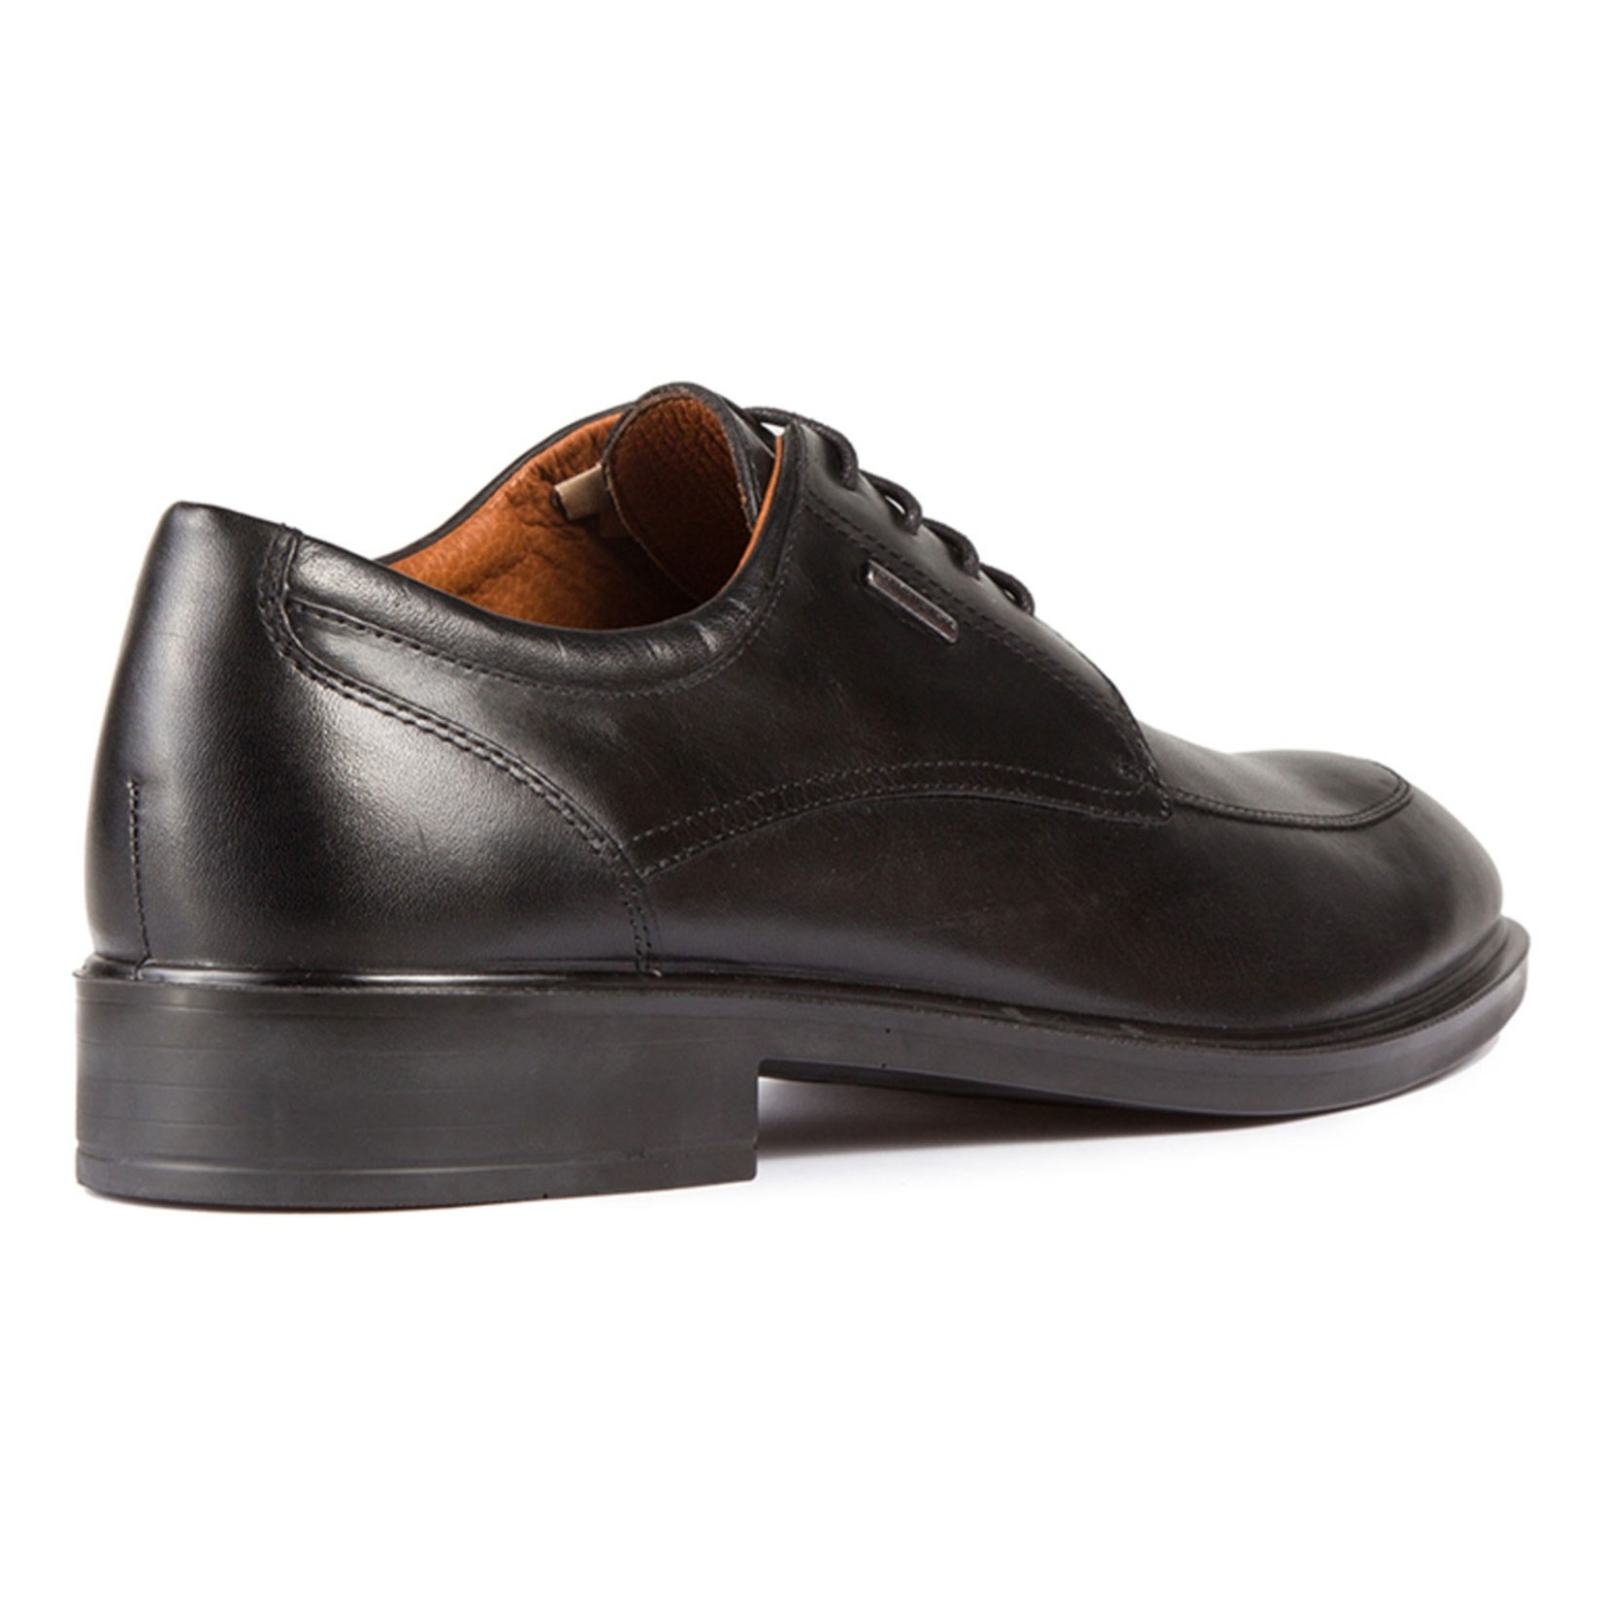 کفش رسمی چرم مردانه - جی اوکس - مشکي - 4